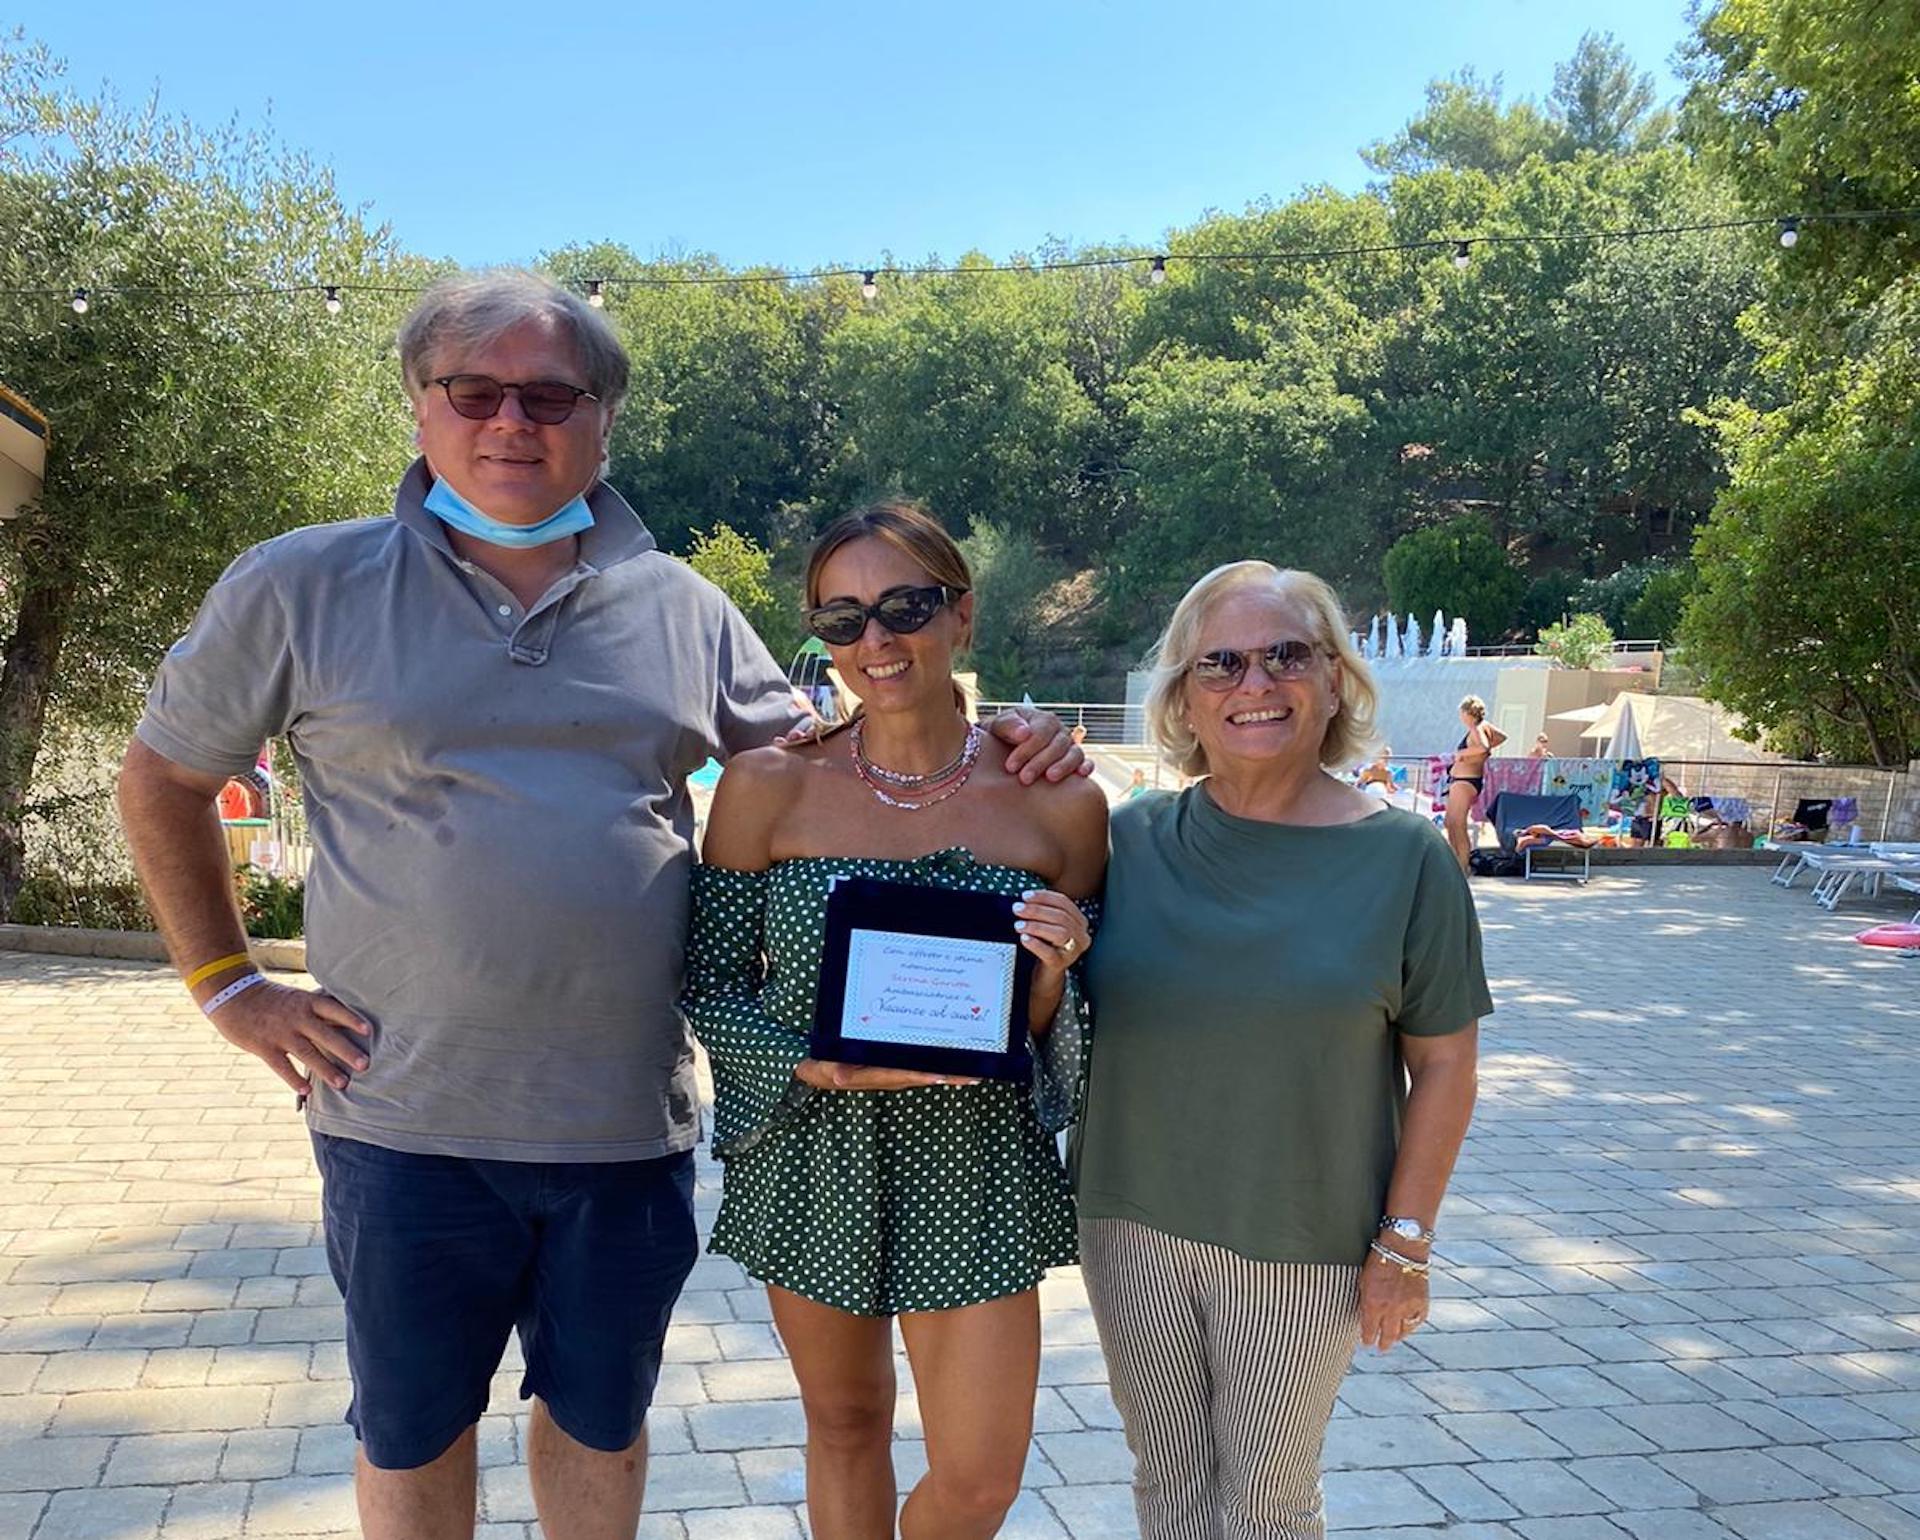 Serena Garitta ambasciatrice di Vacanze col Cuore!